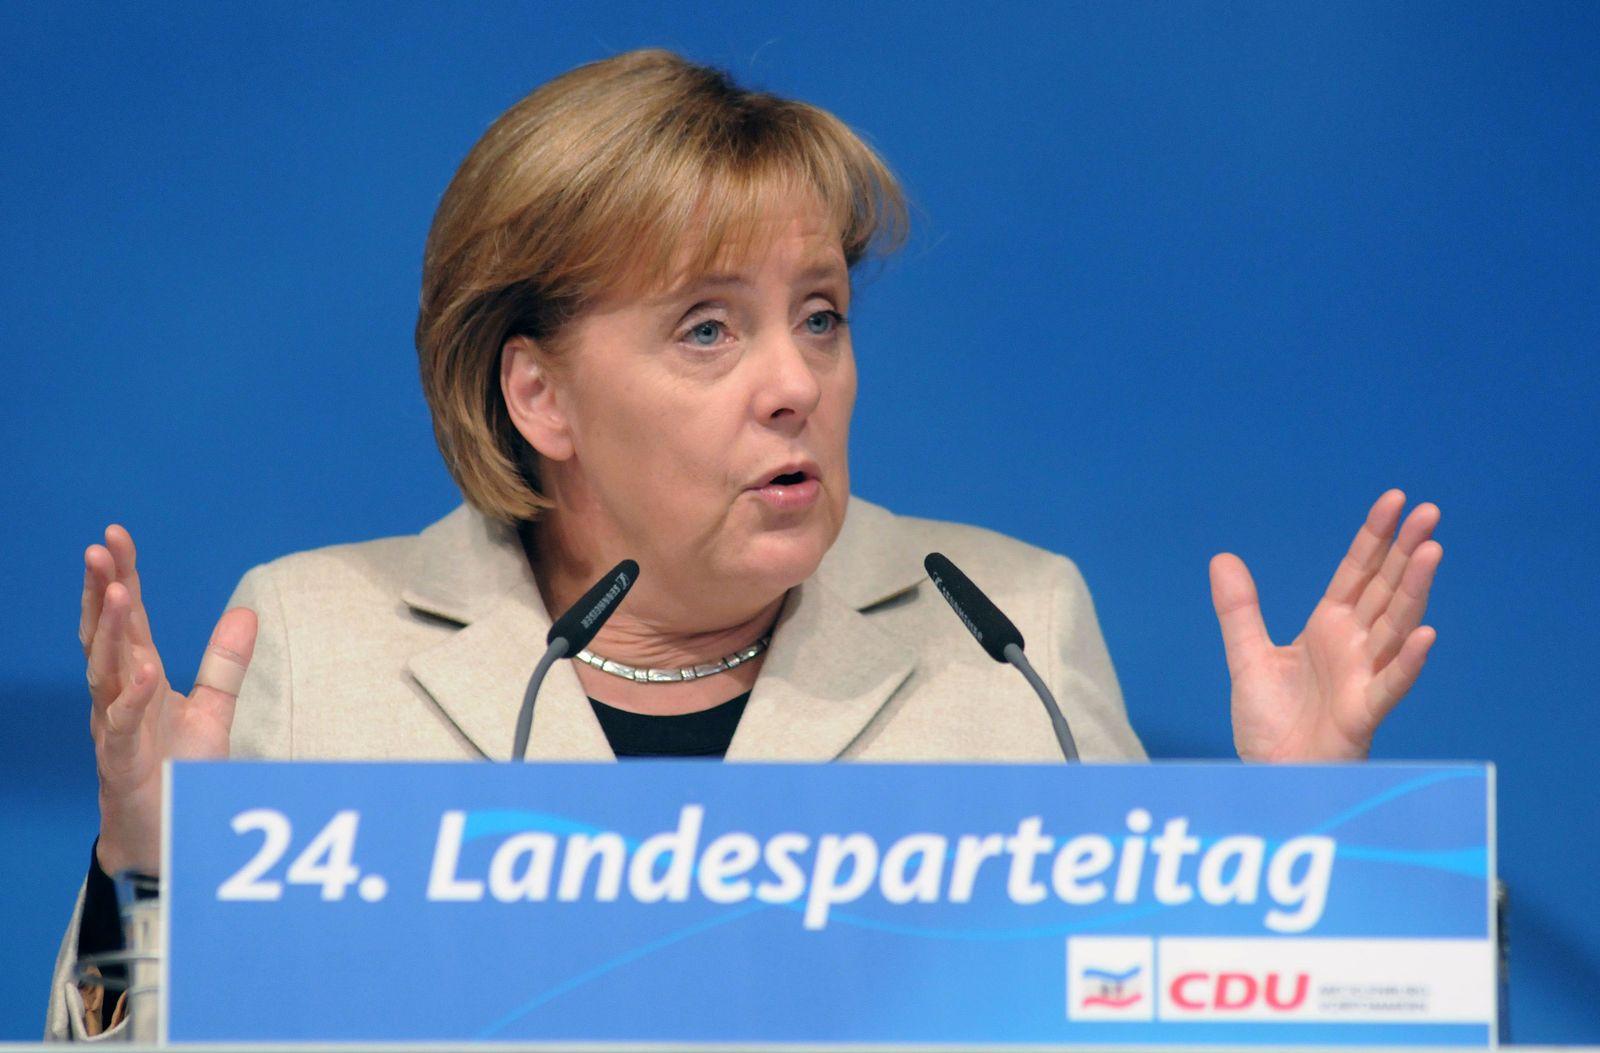 DEU MV CDU Merkel